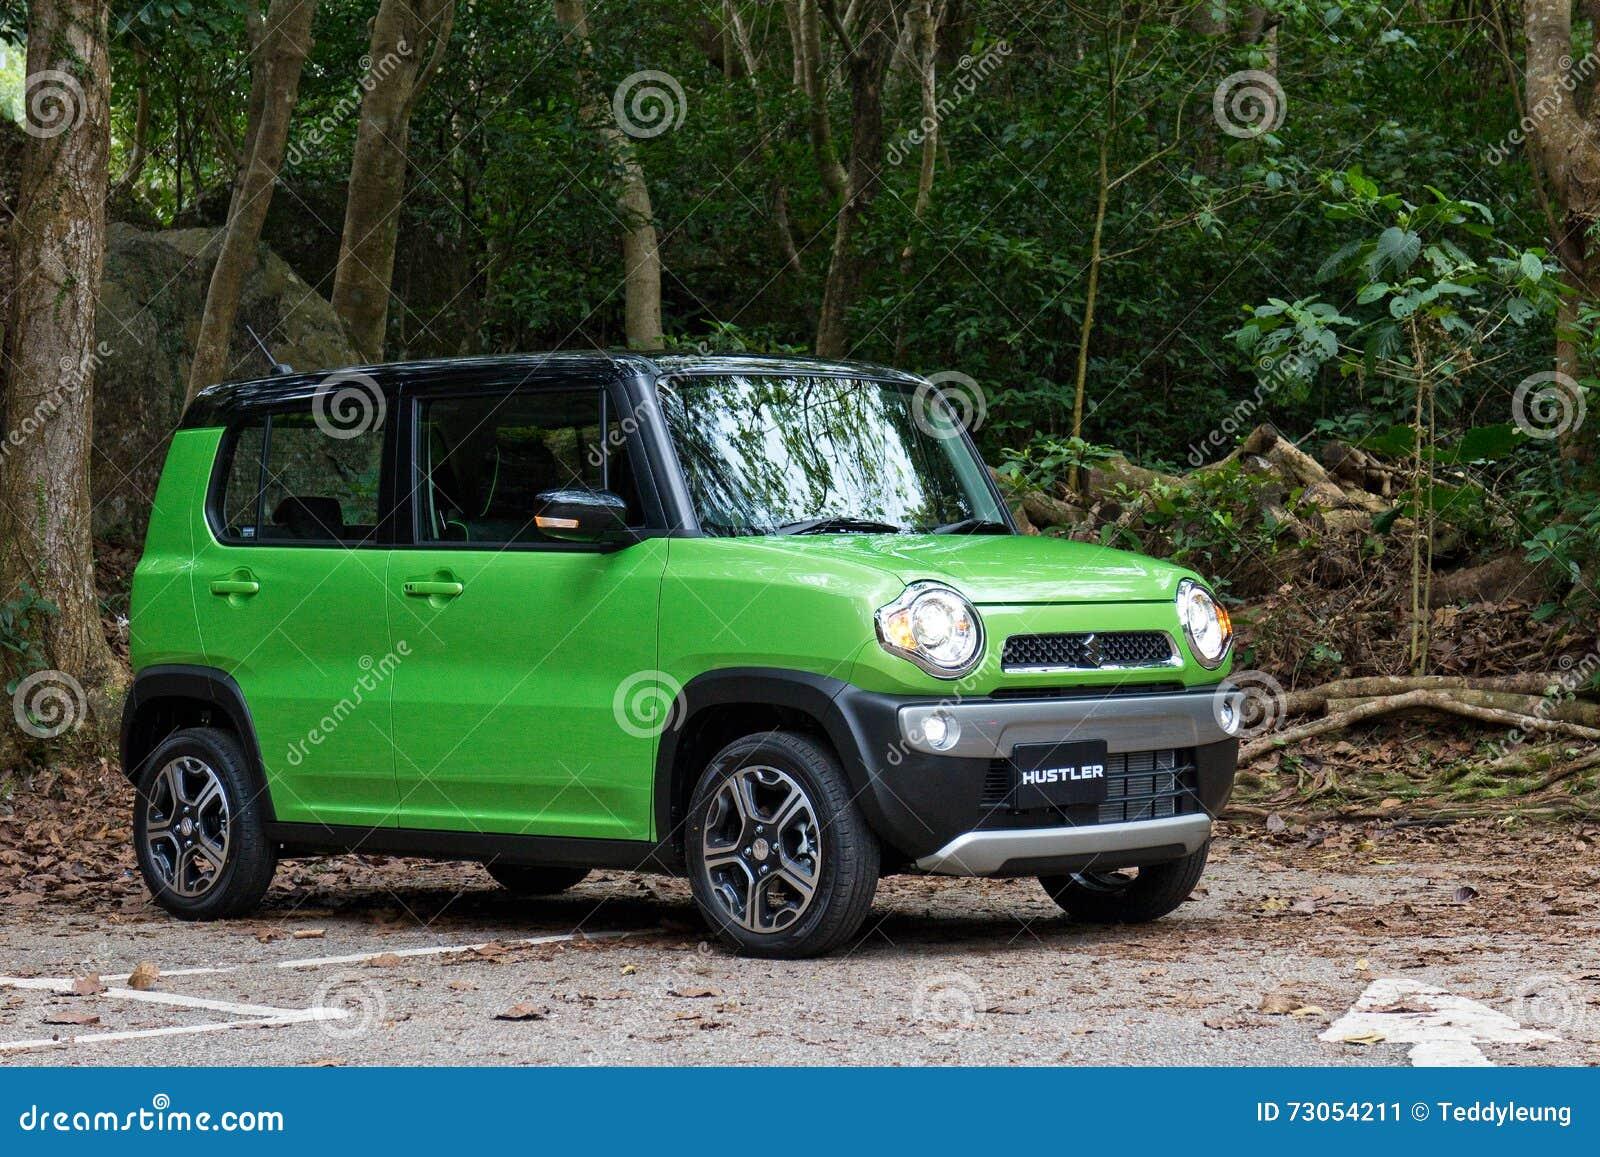 Green hustler car